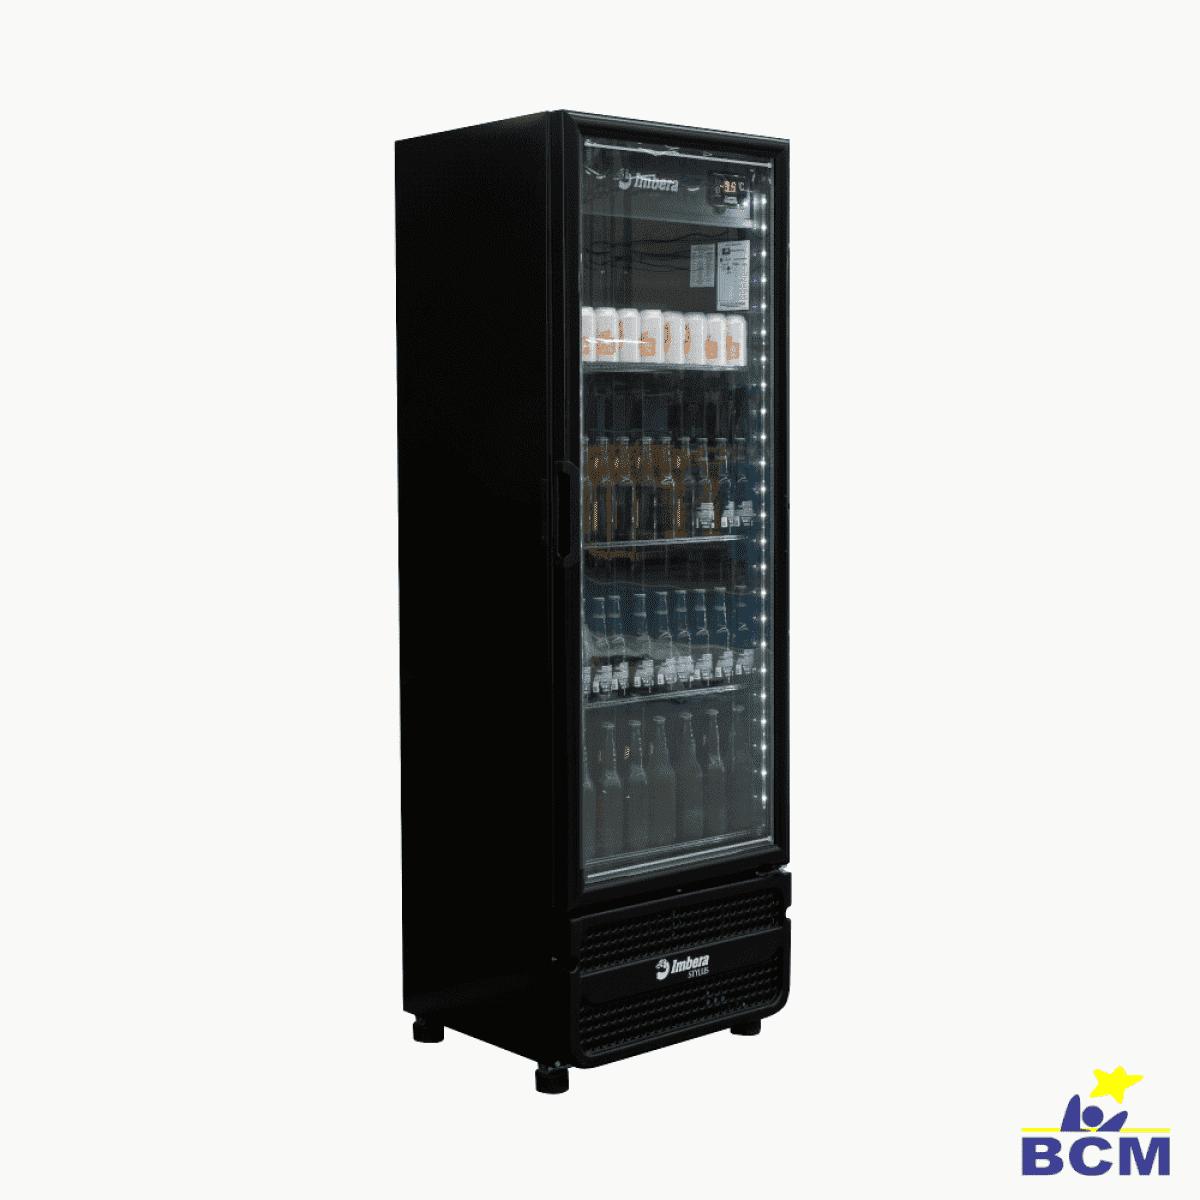 Cervejeira Imbera CCV315 454L Stylus porta de vidro